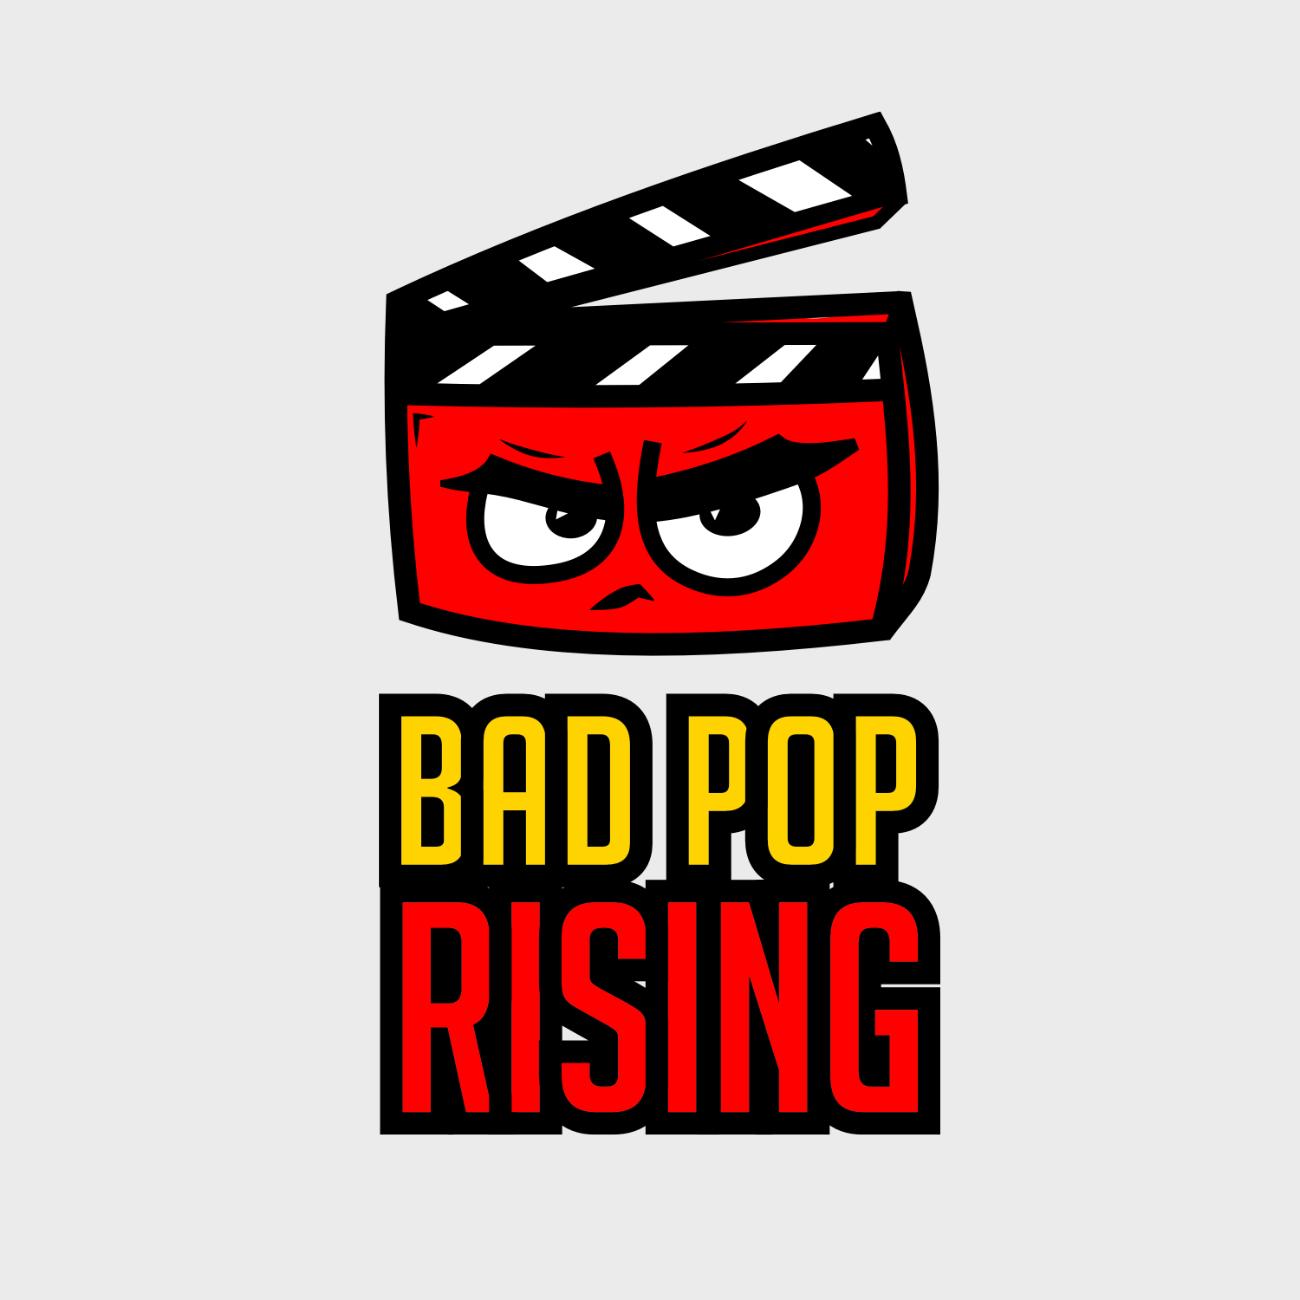 Bad Pop Rising Logo for podcast